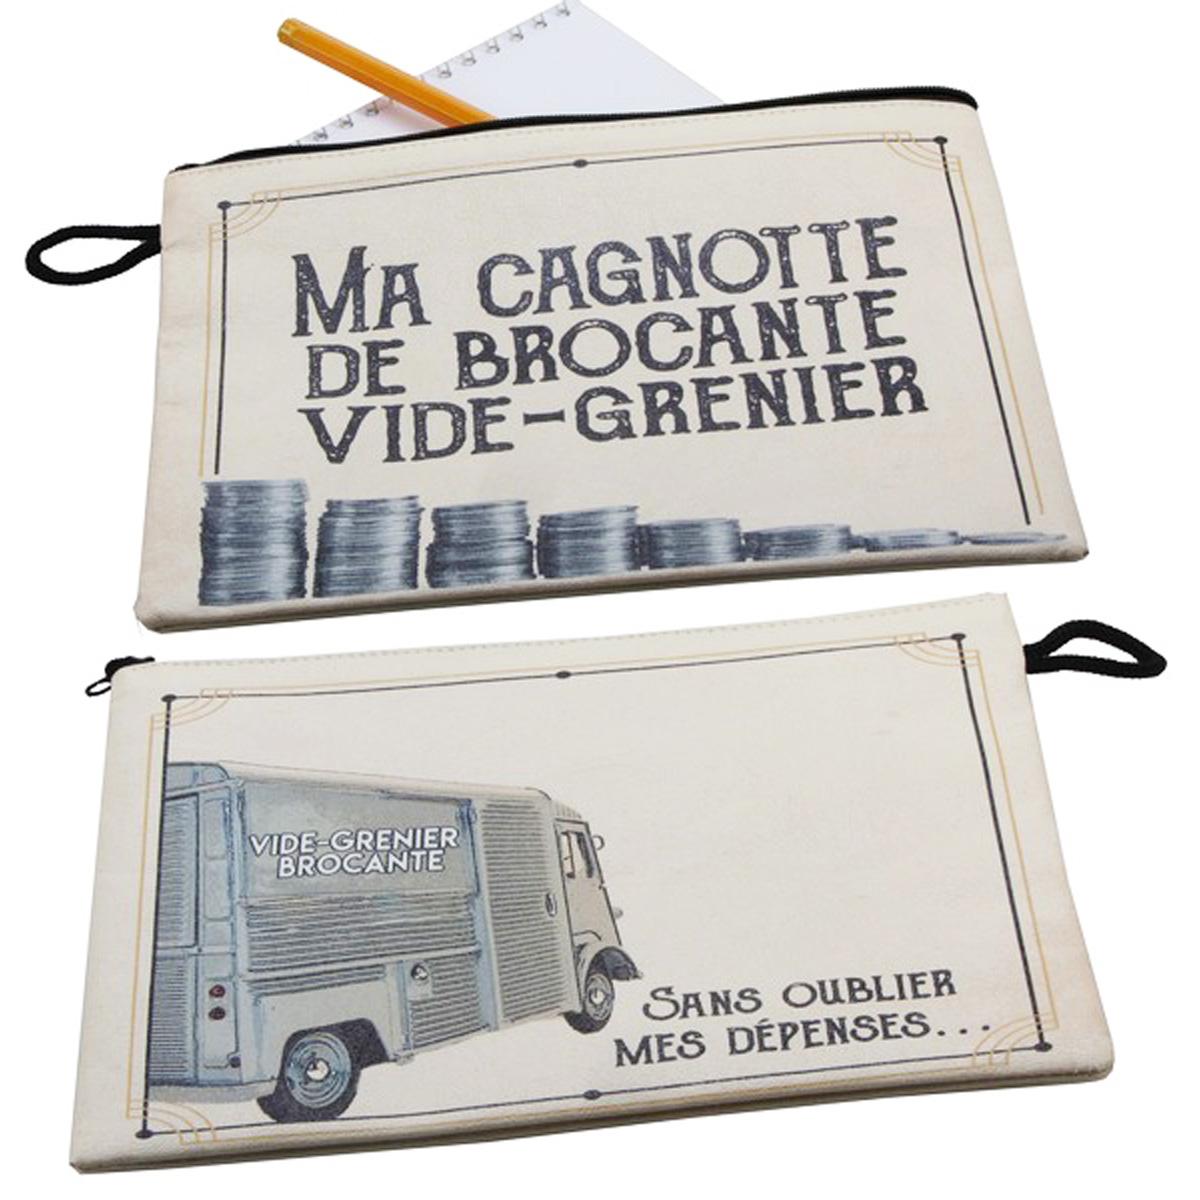 Pochette plate \'Ma Cagnotte Brocante Vide-Grenier\' gris - 21x16 cm - [A0480]